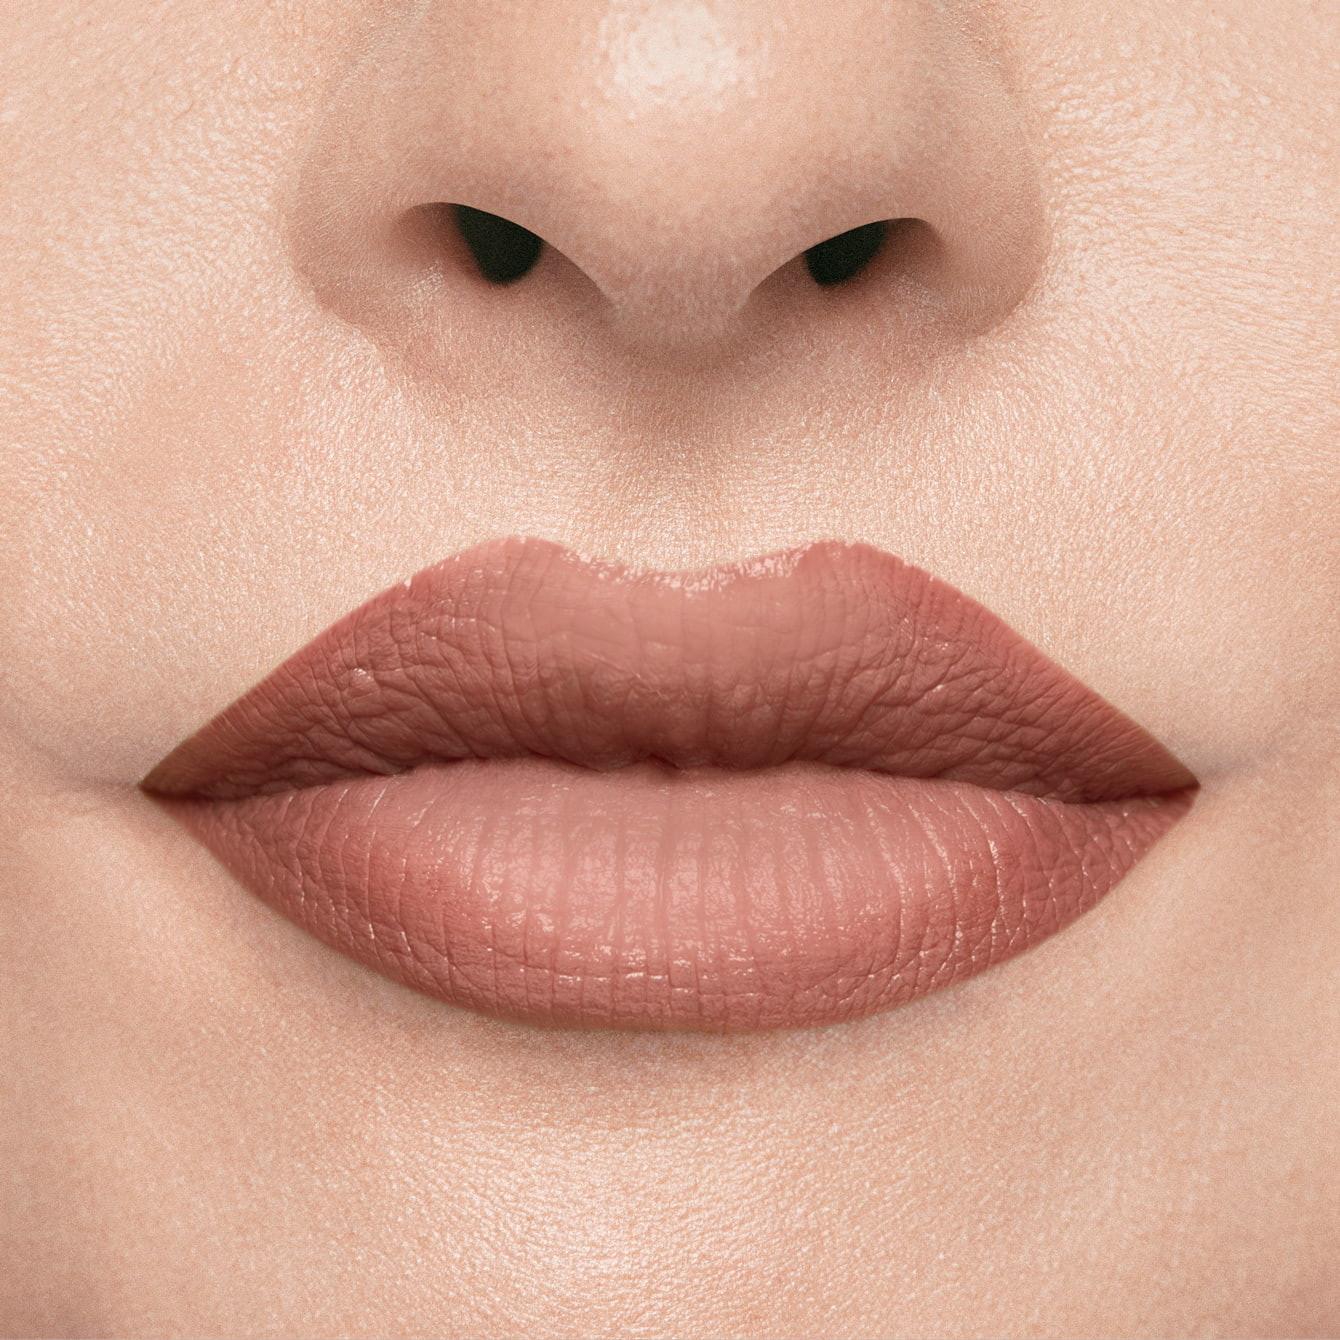 NEO Make Up Pomadka powiększająca usta Shape Up Effect Lipstick 21 Beauty NEO MAKE UP 7956